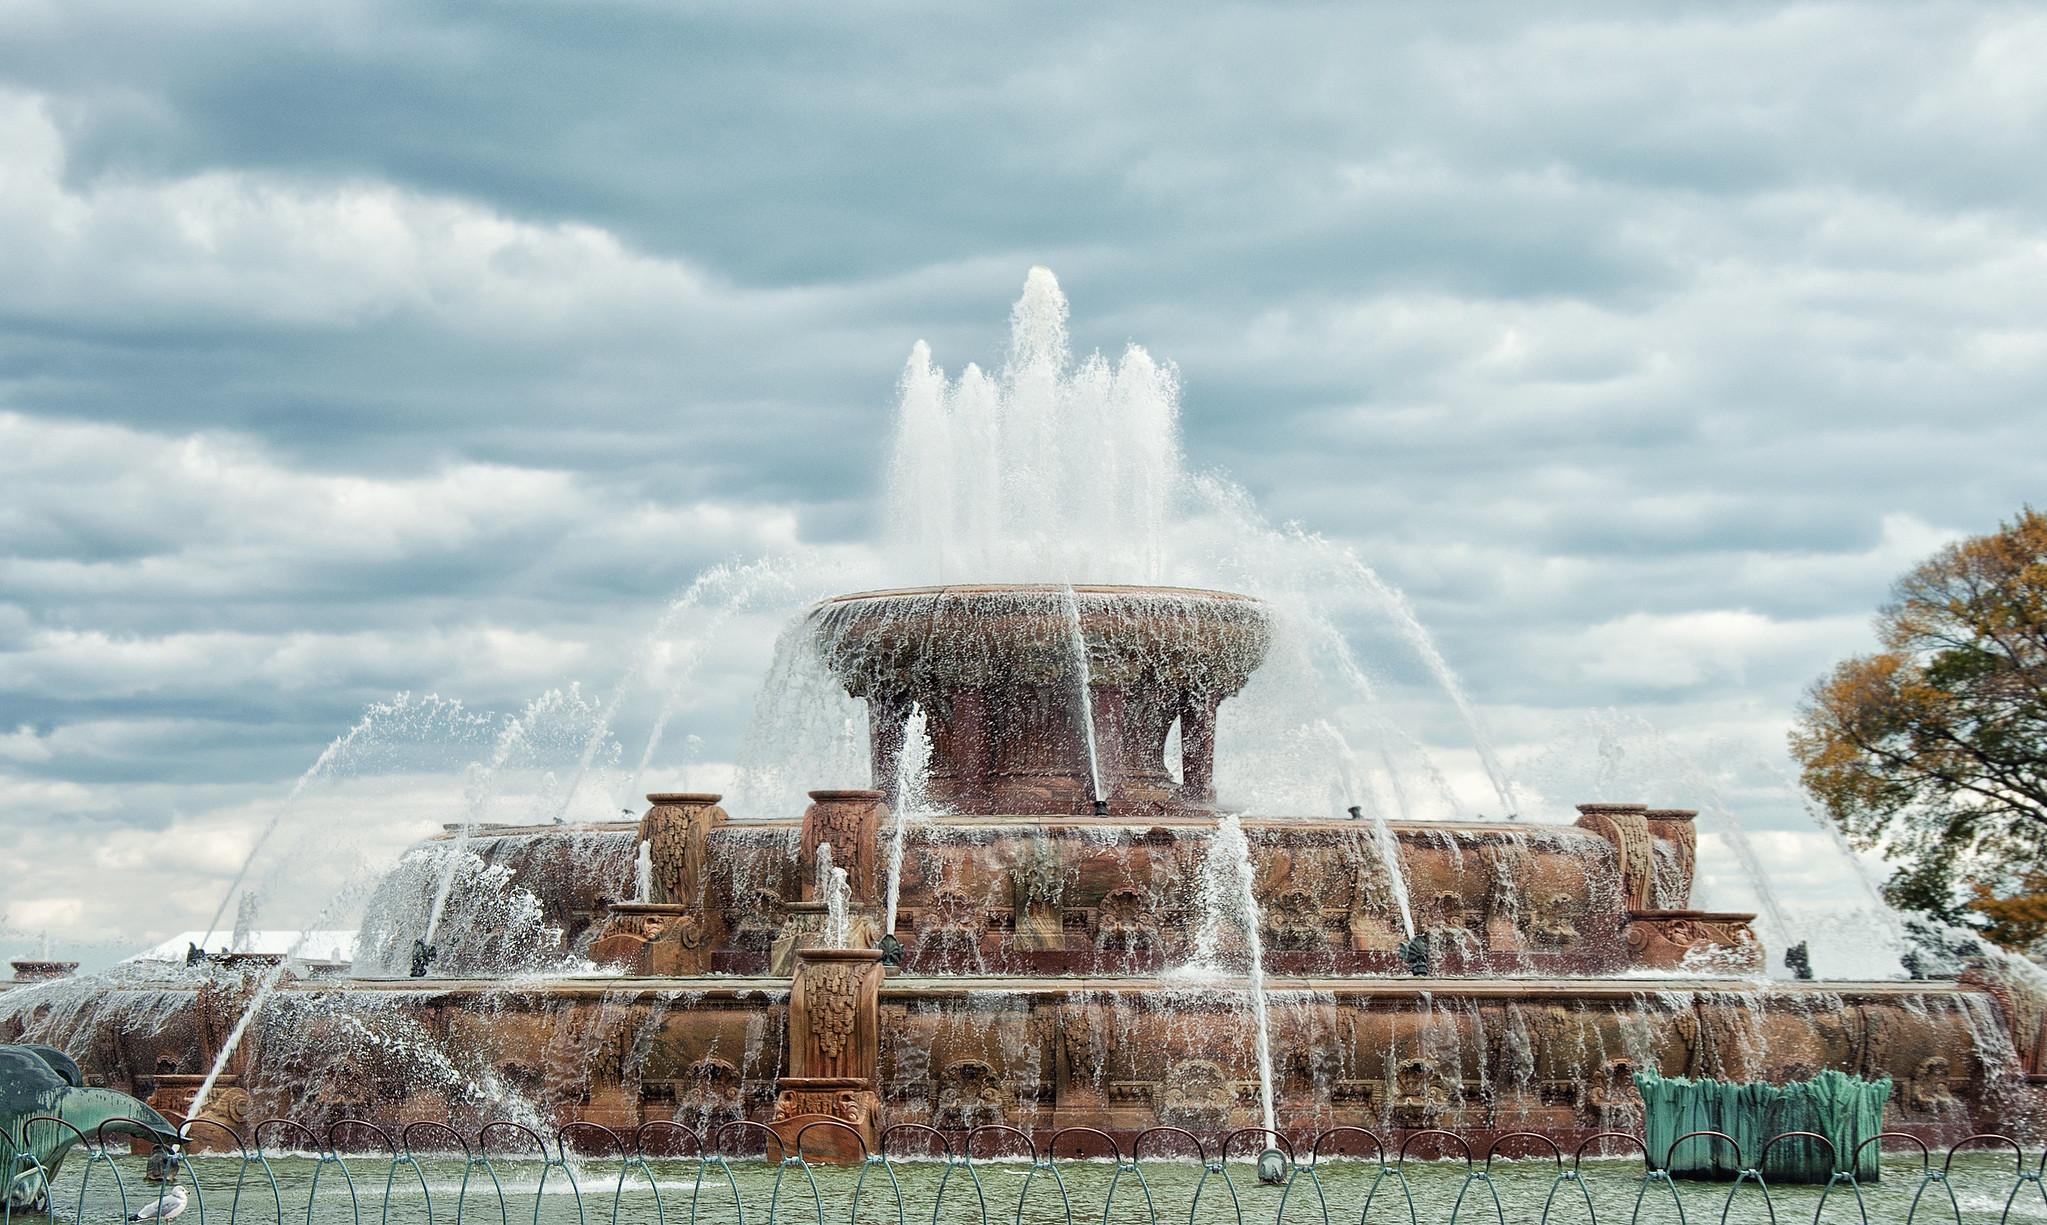 Buckingham Fountain - Grant Park, Chicago